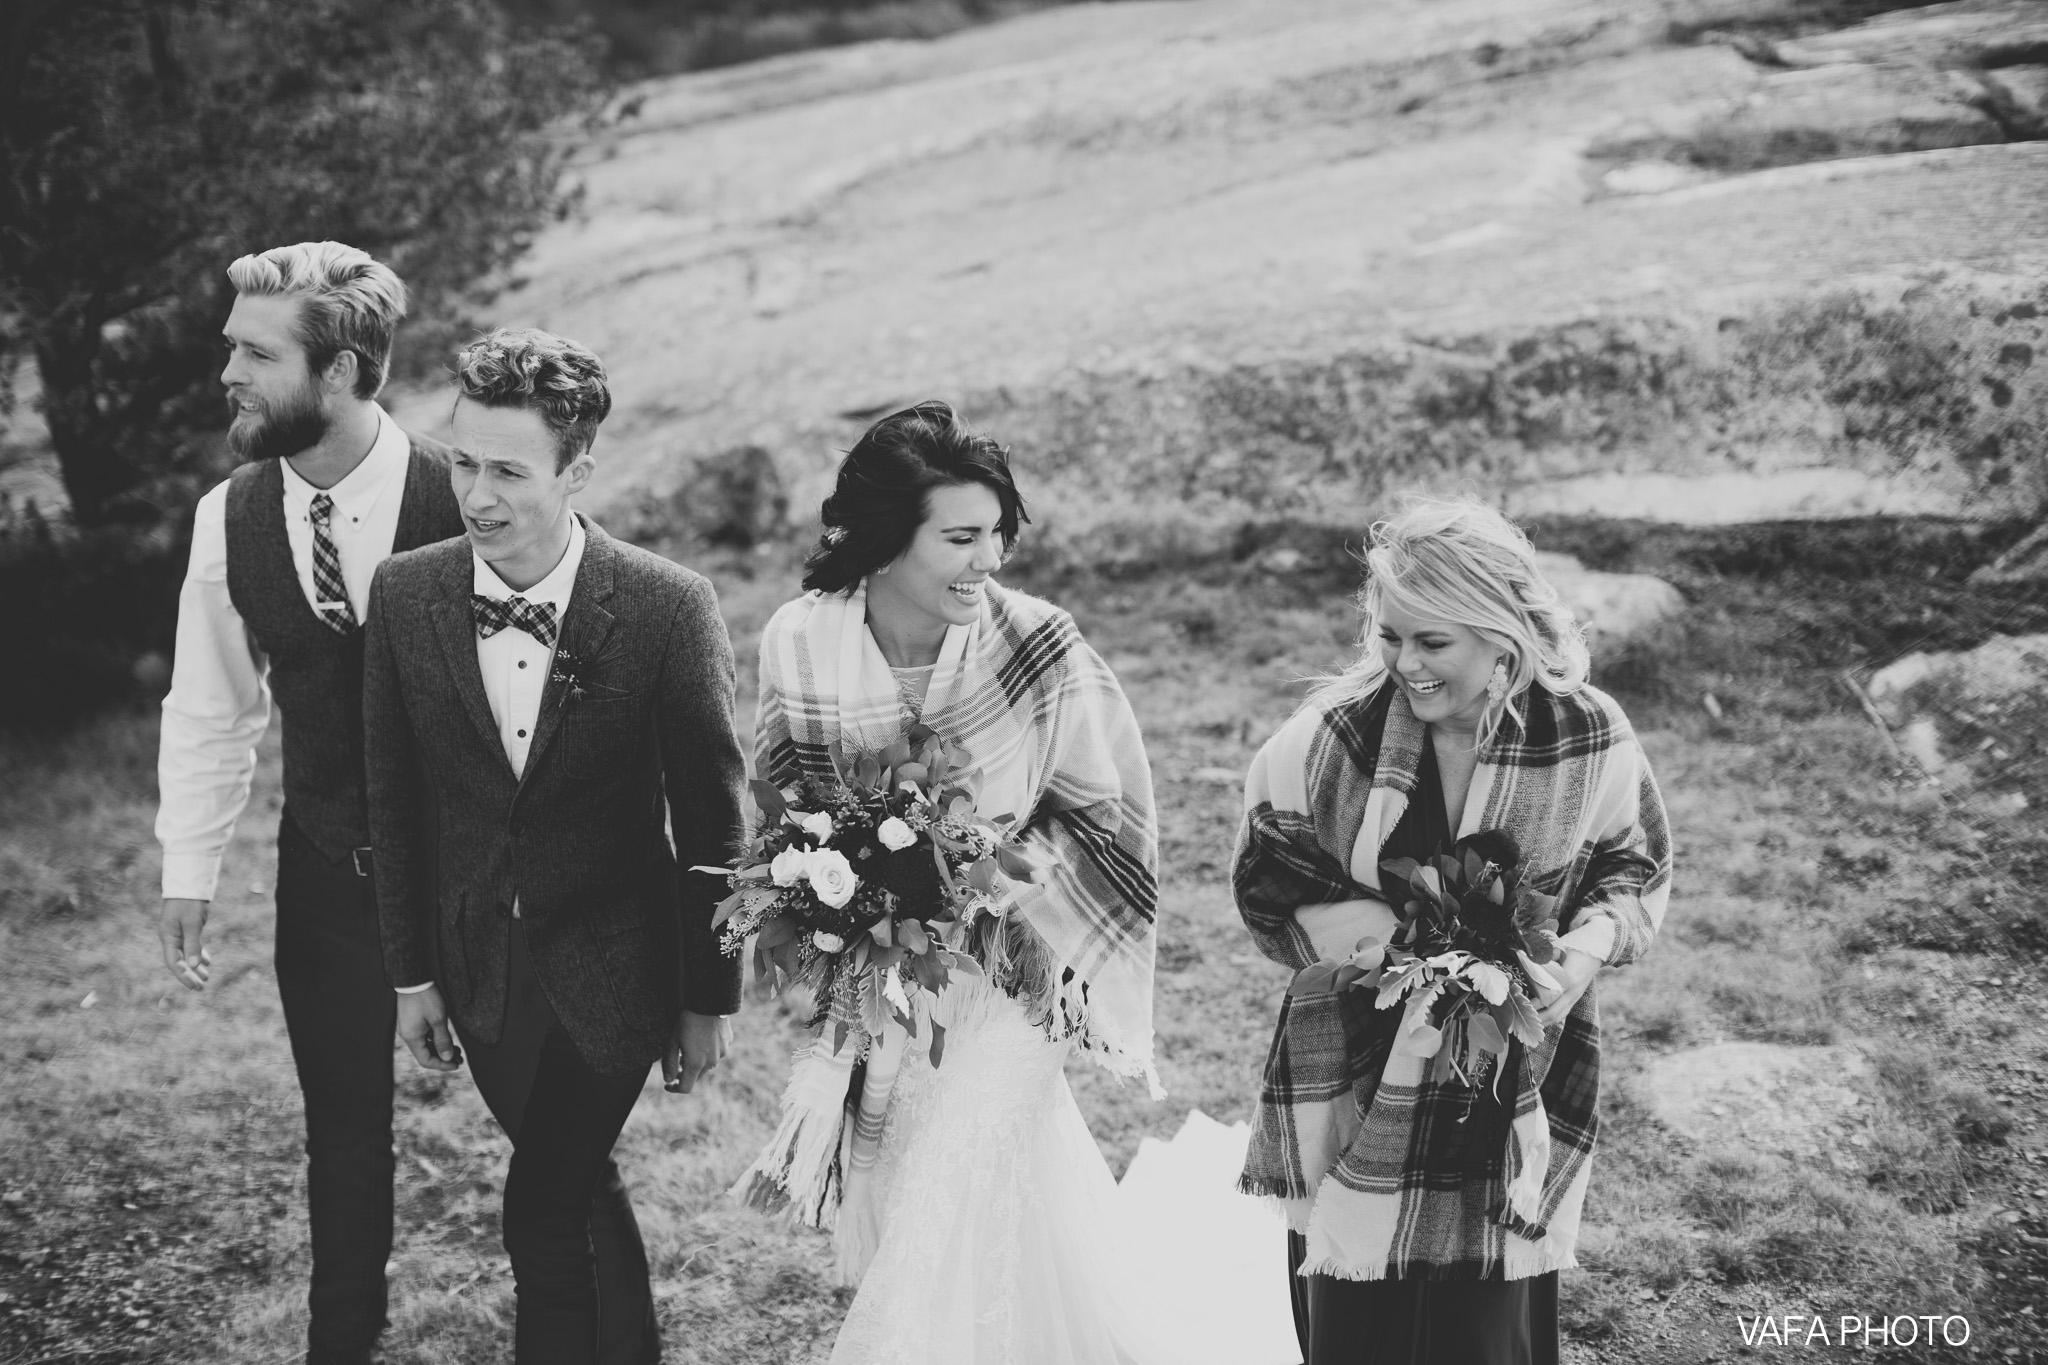 Hogback-Mountain-Wedding-Chelsea-Josh-Vafa-Photo-312.jpg